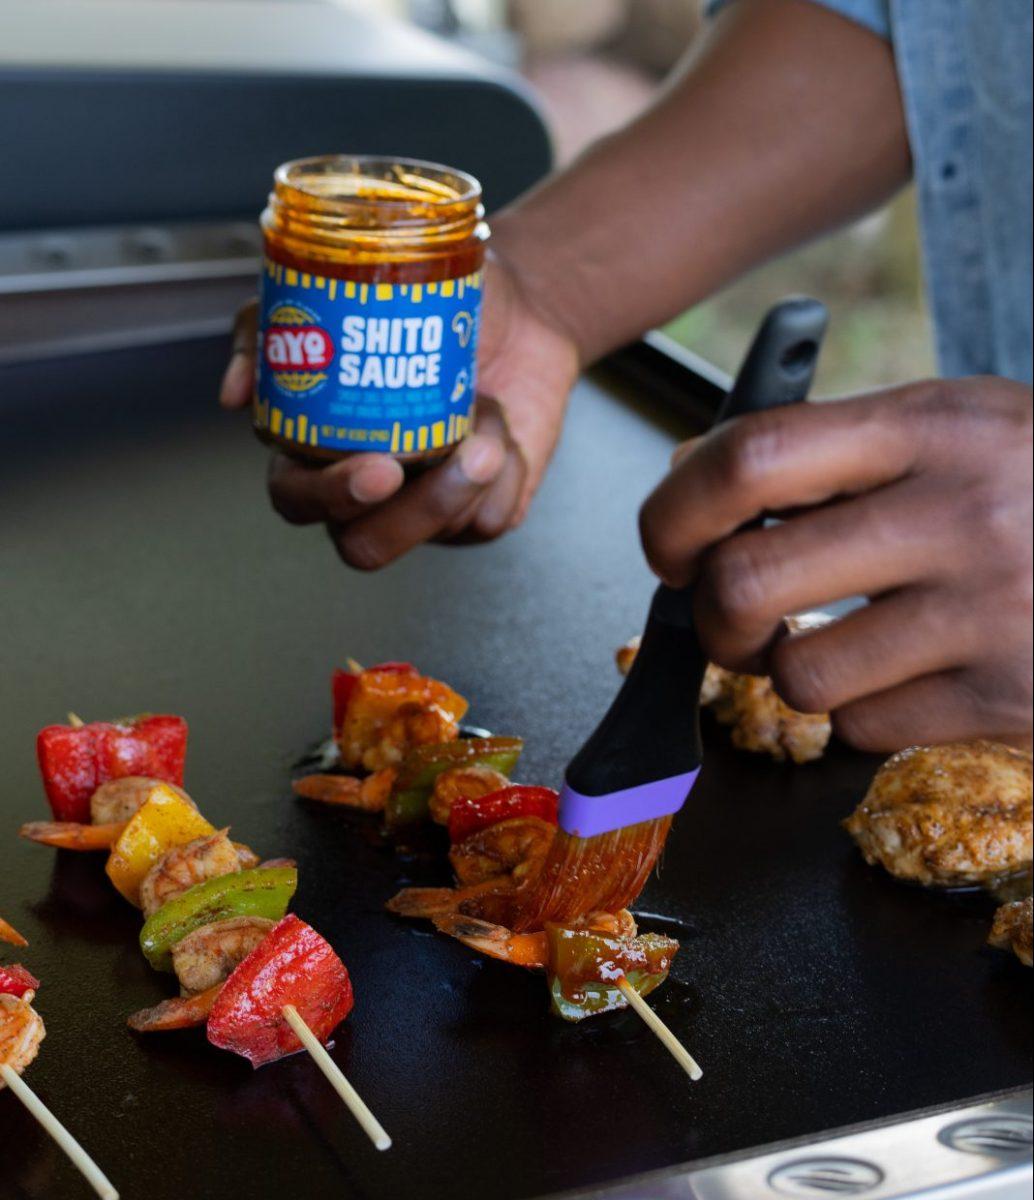 AYO Shito Sauce created by Chef Eric Adjepong